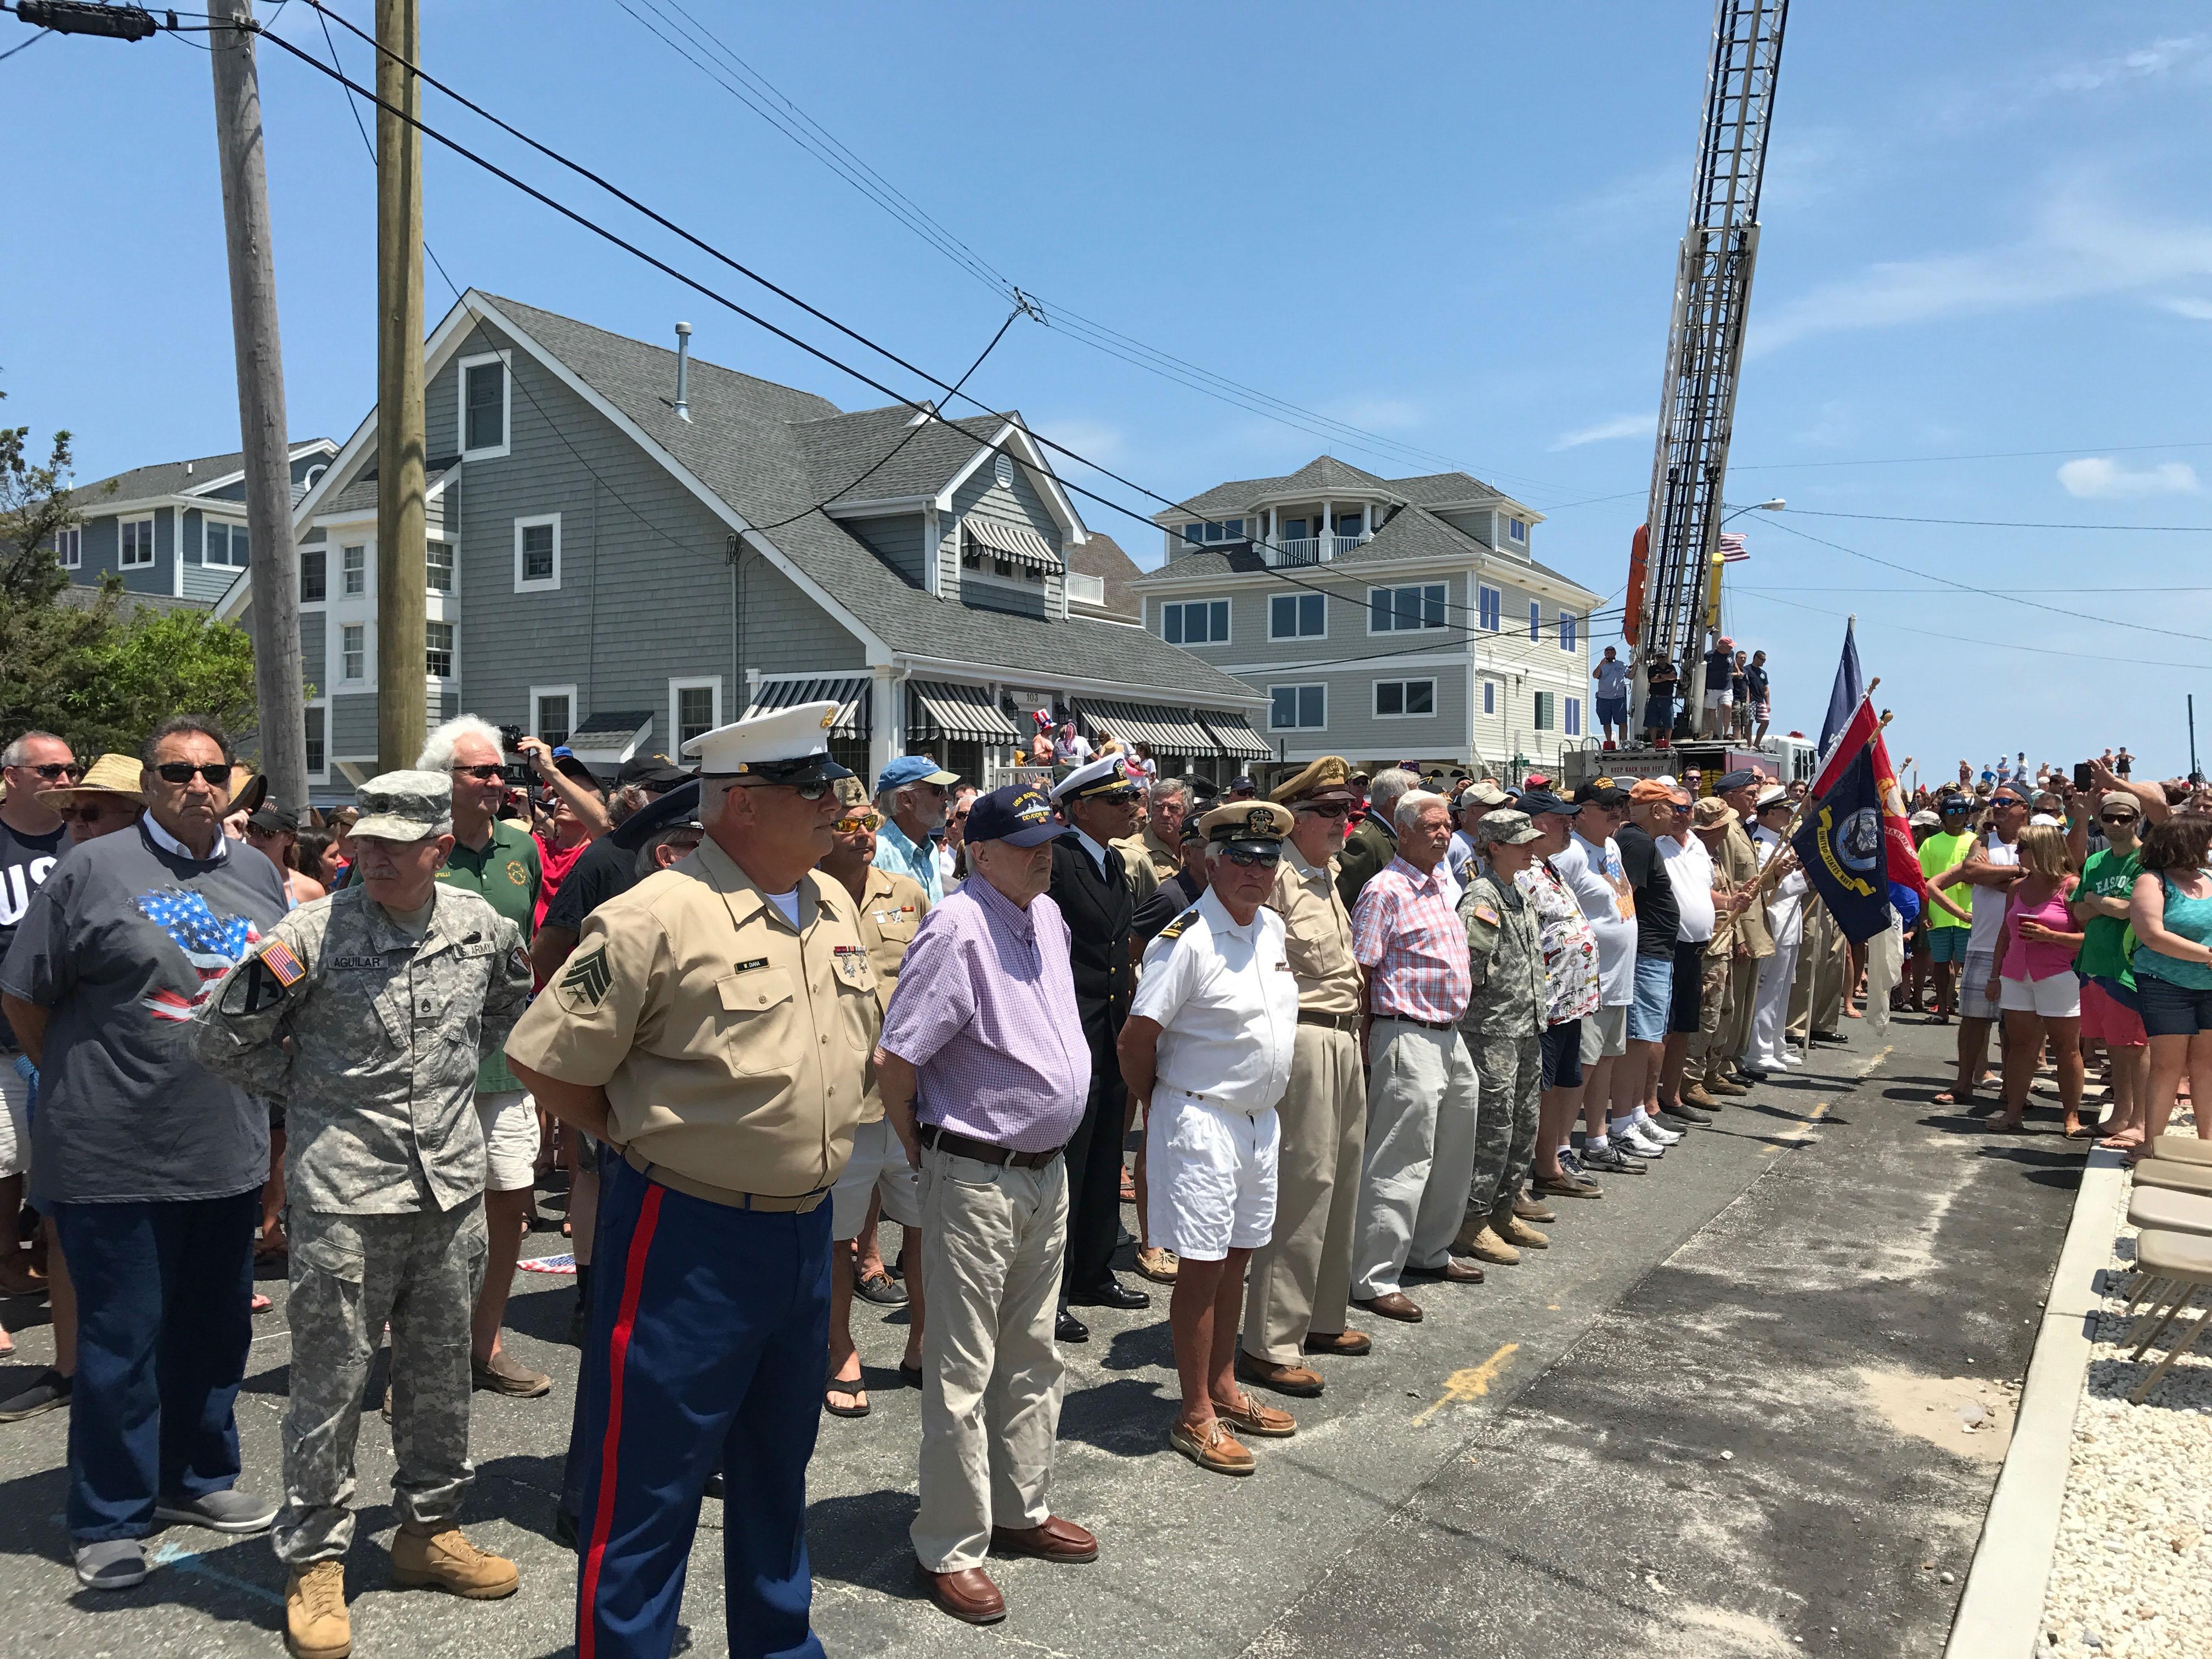 The 2017 Normandy Beach July 4 flag raising. (Photo: Daniel Nee)